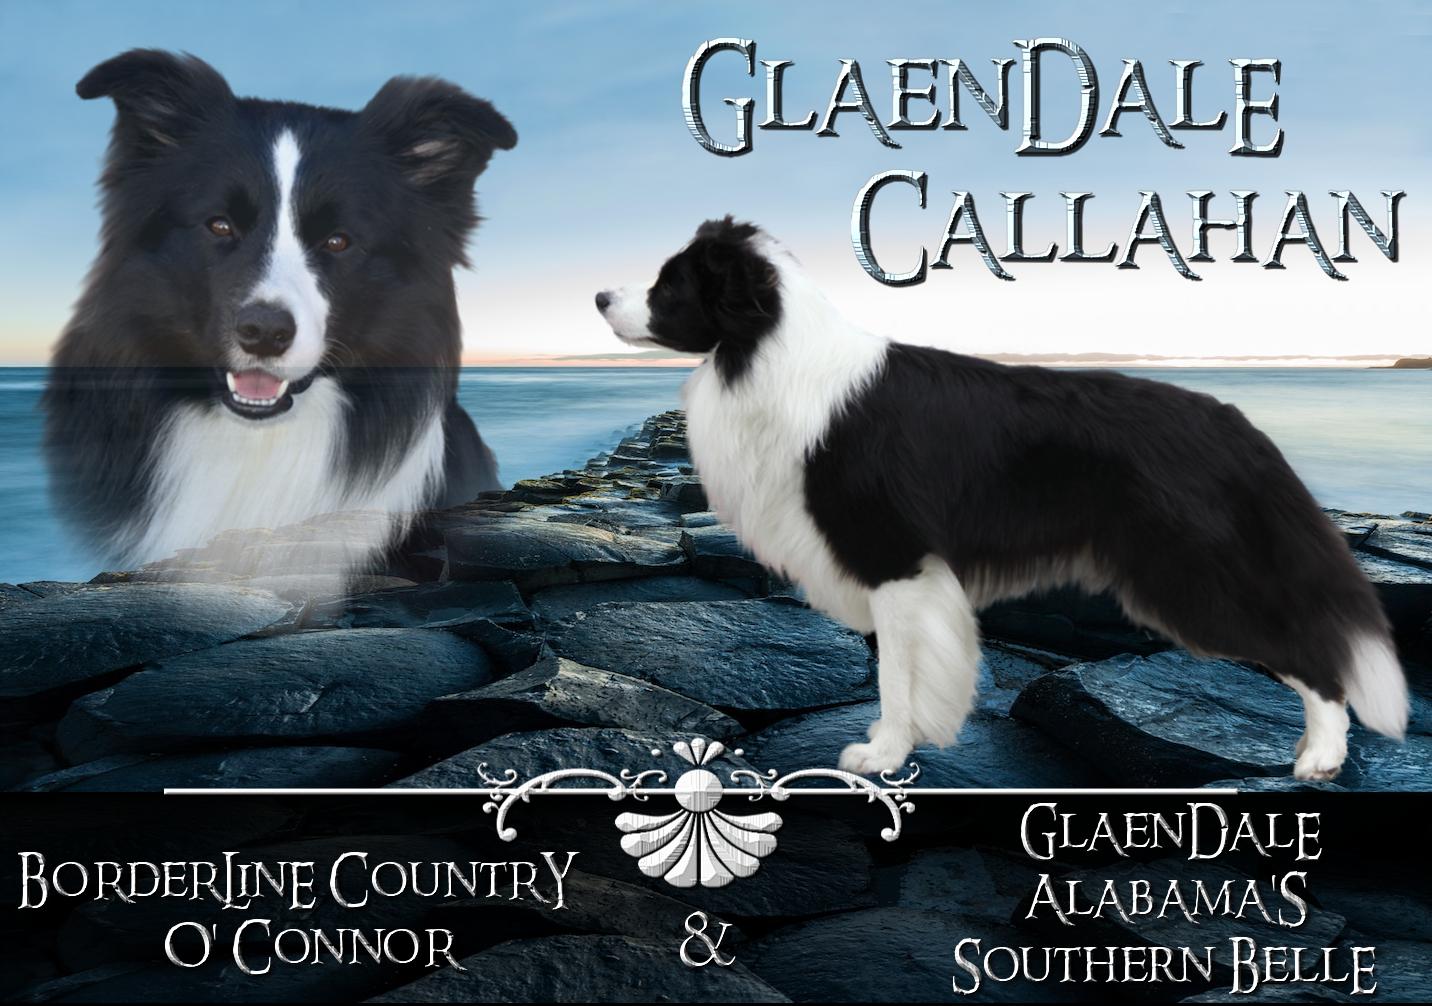 Glaendale Callahan_Studdog collage 07_20